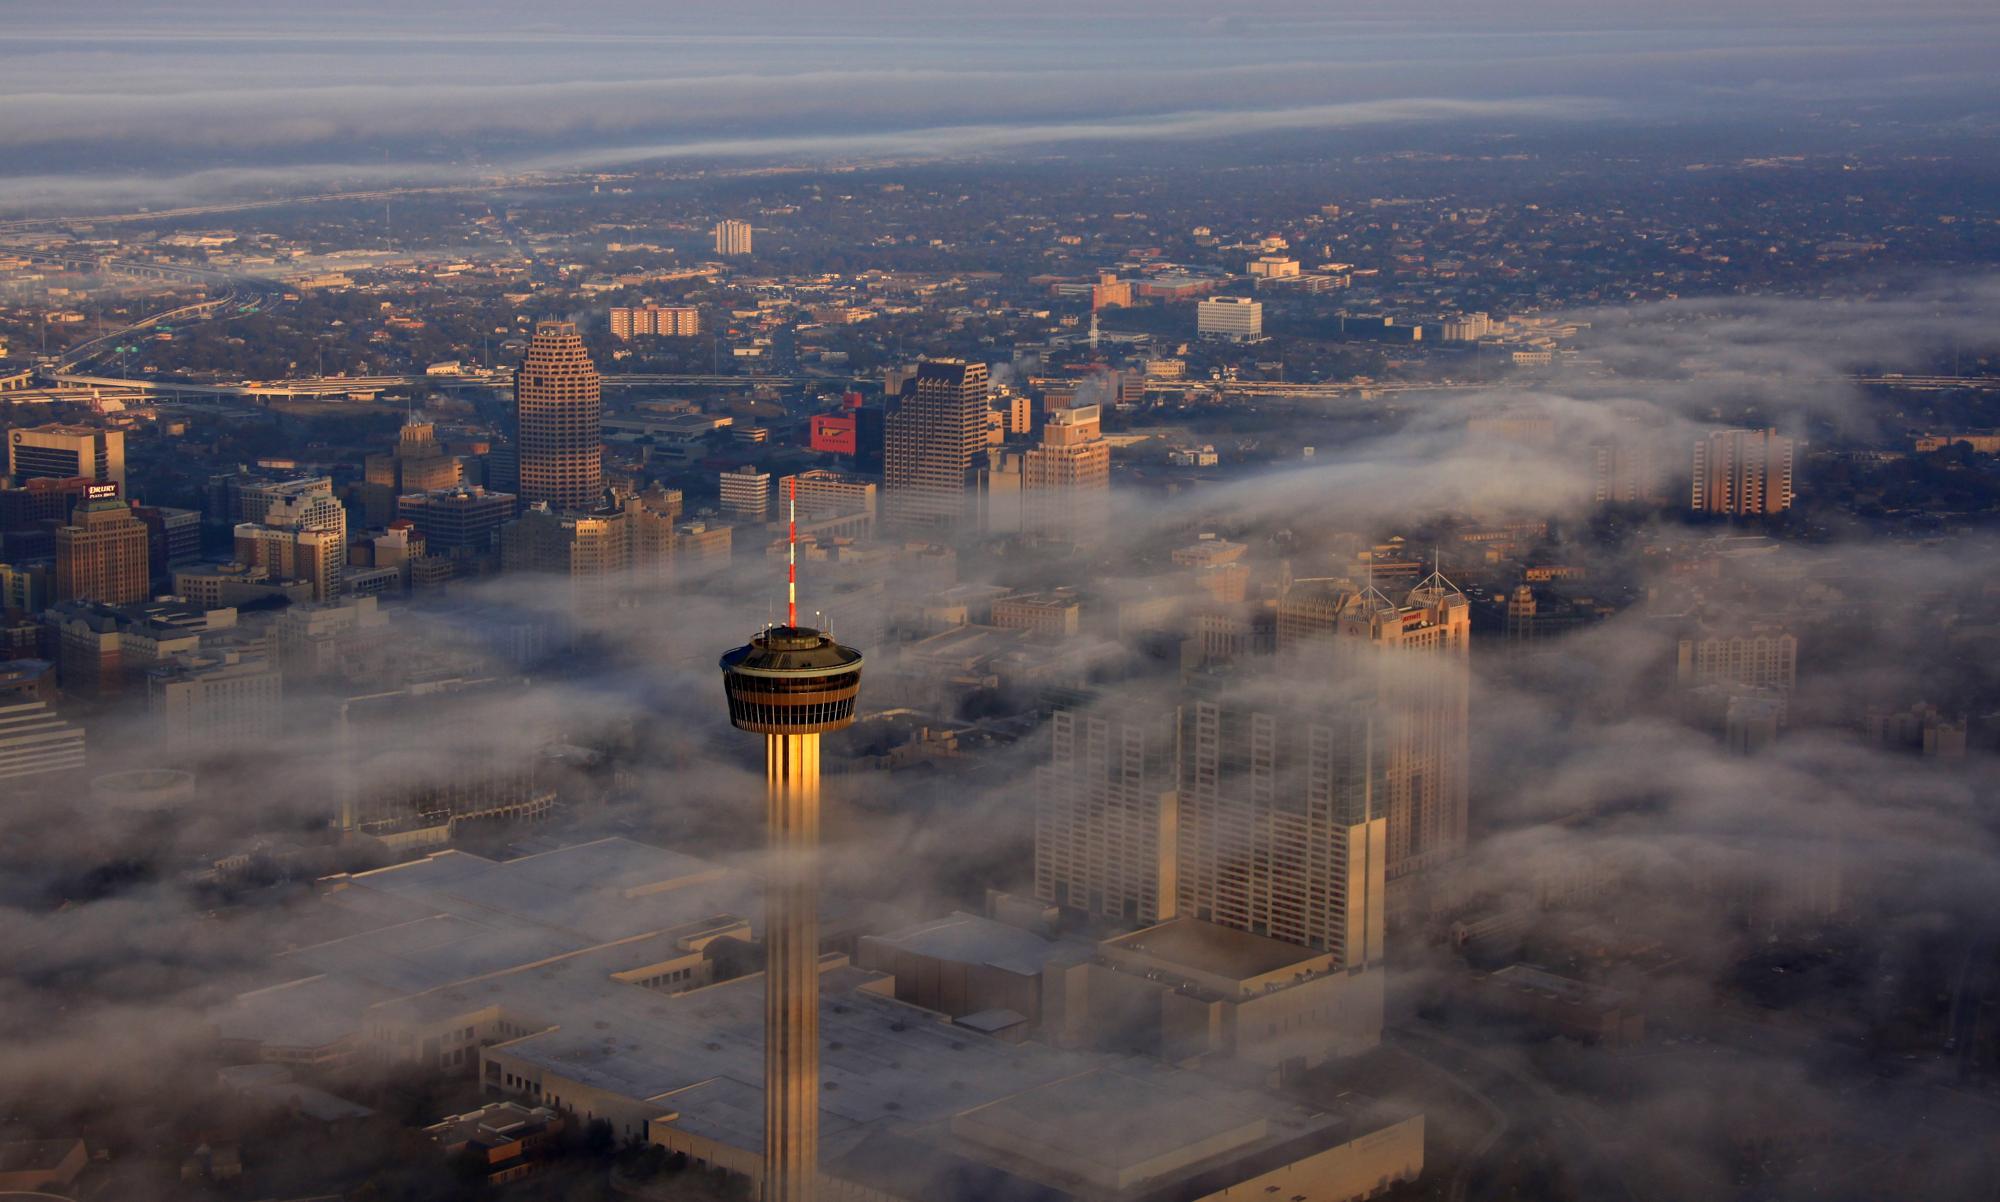 Wispy Dawn, San Antonio, Texas - Texas Aerial Photography - Texas Real Estate Photography - Texas Drone Photography - San Antonio, TX